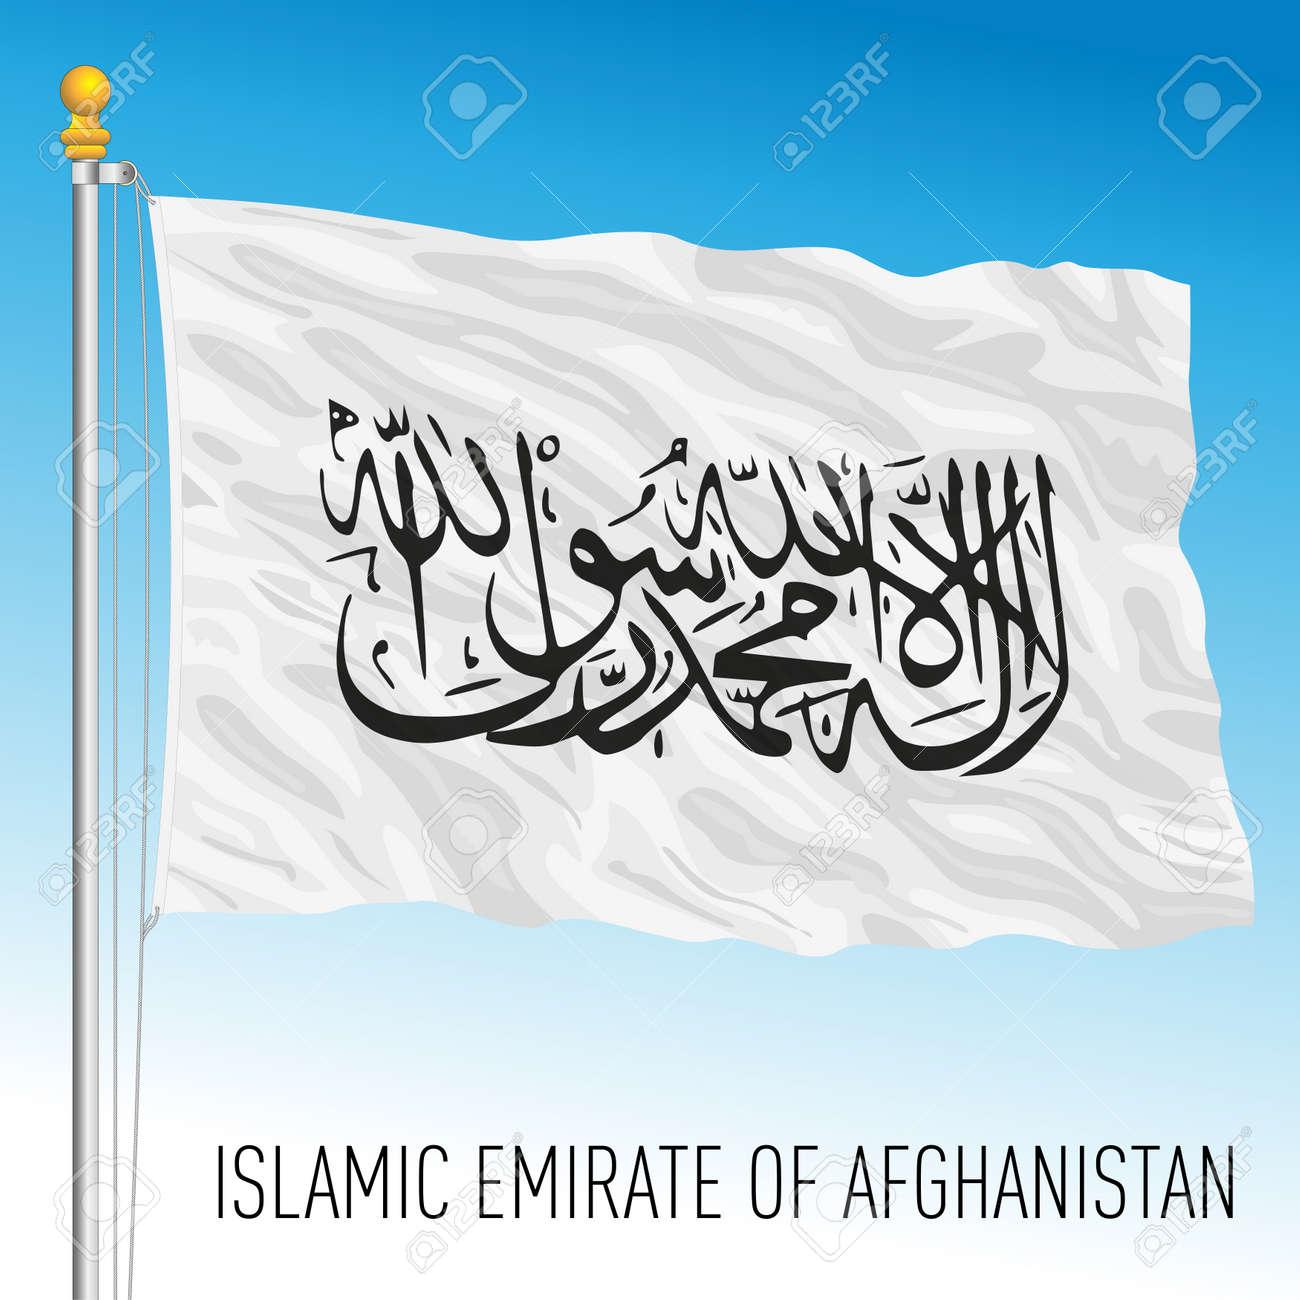 Islamic Emirate of Afghanistan national flag, vector illustration - 172973695